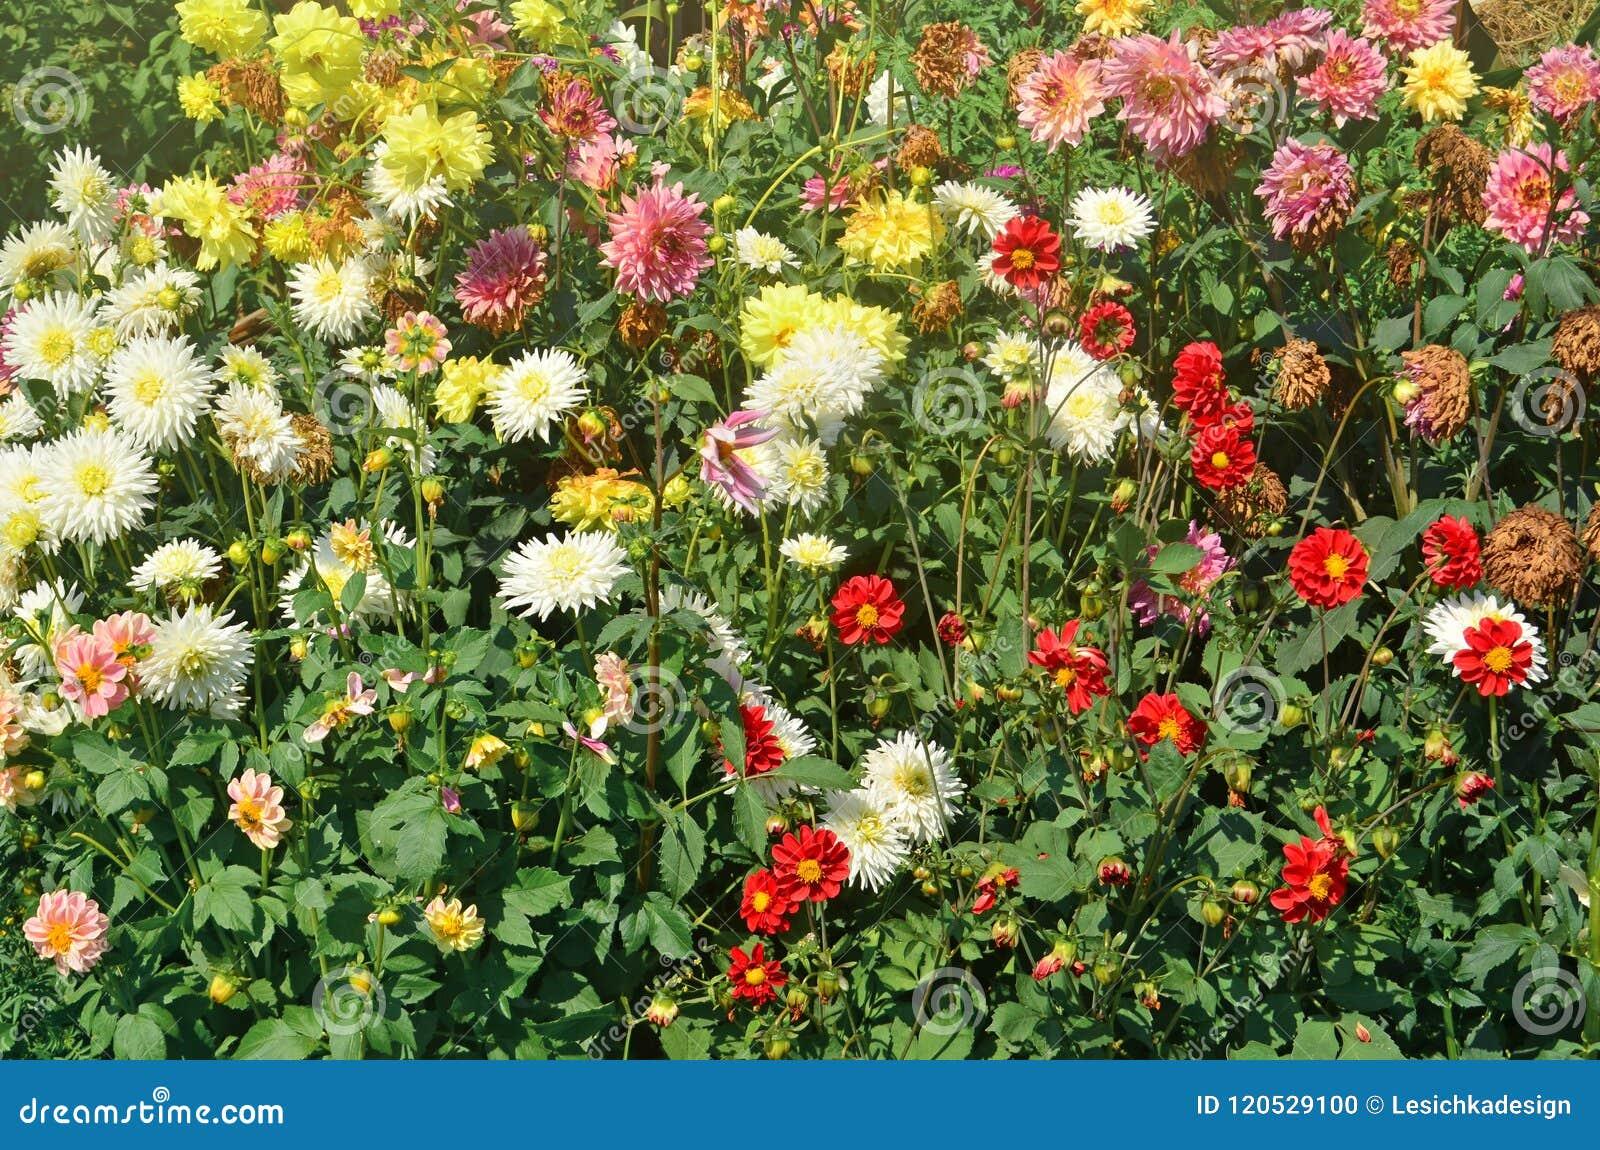 Dahlia Flowers In Garden Stock Photo Image Of Bright 120529100